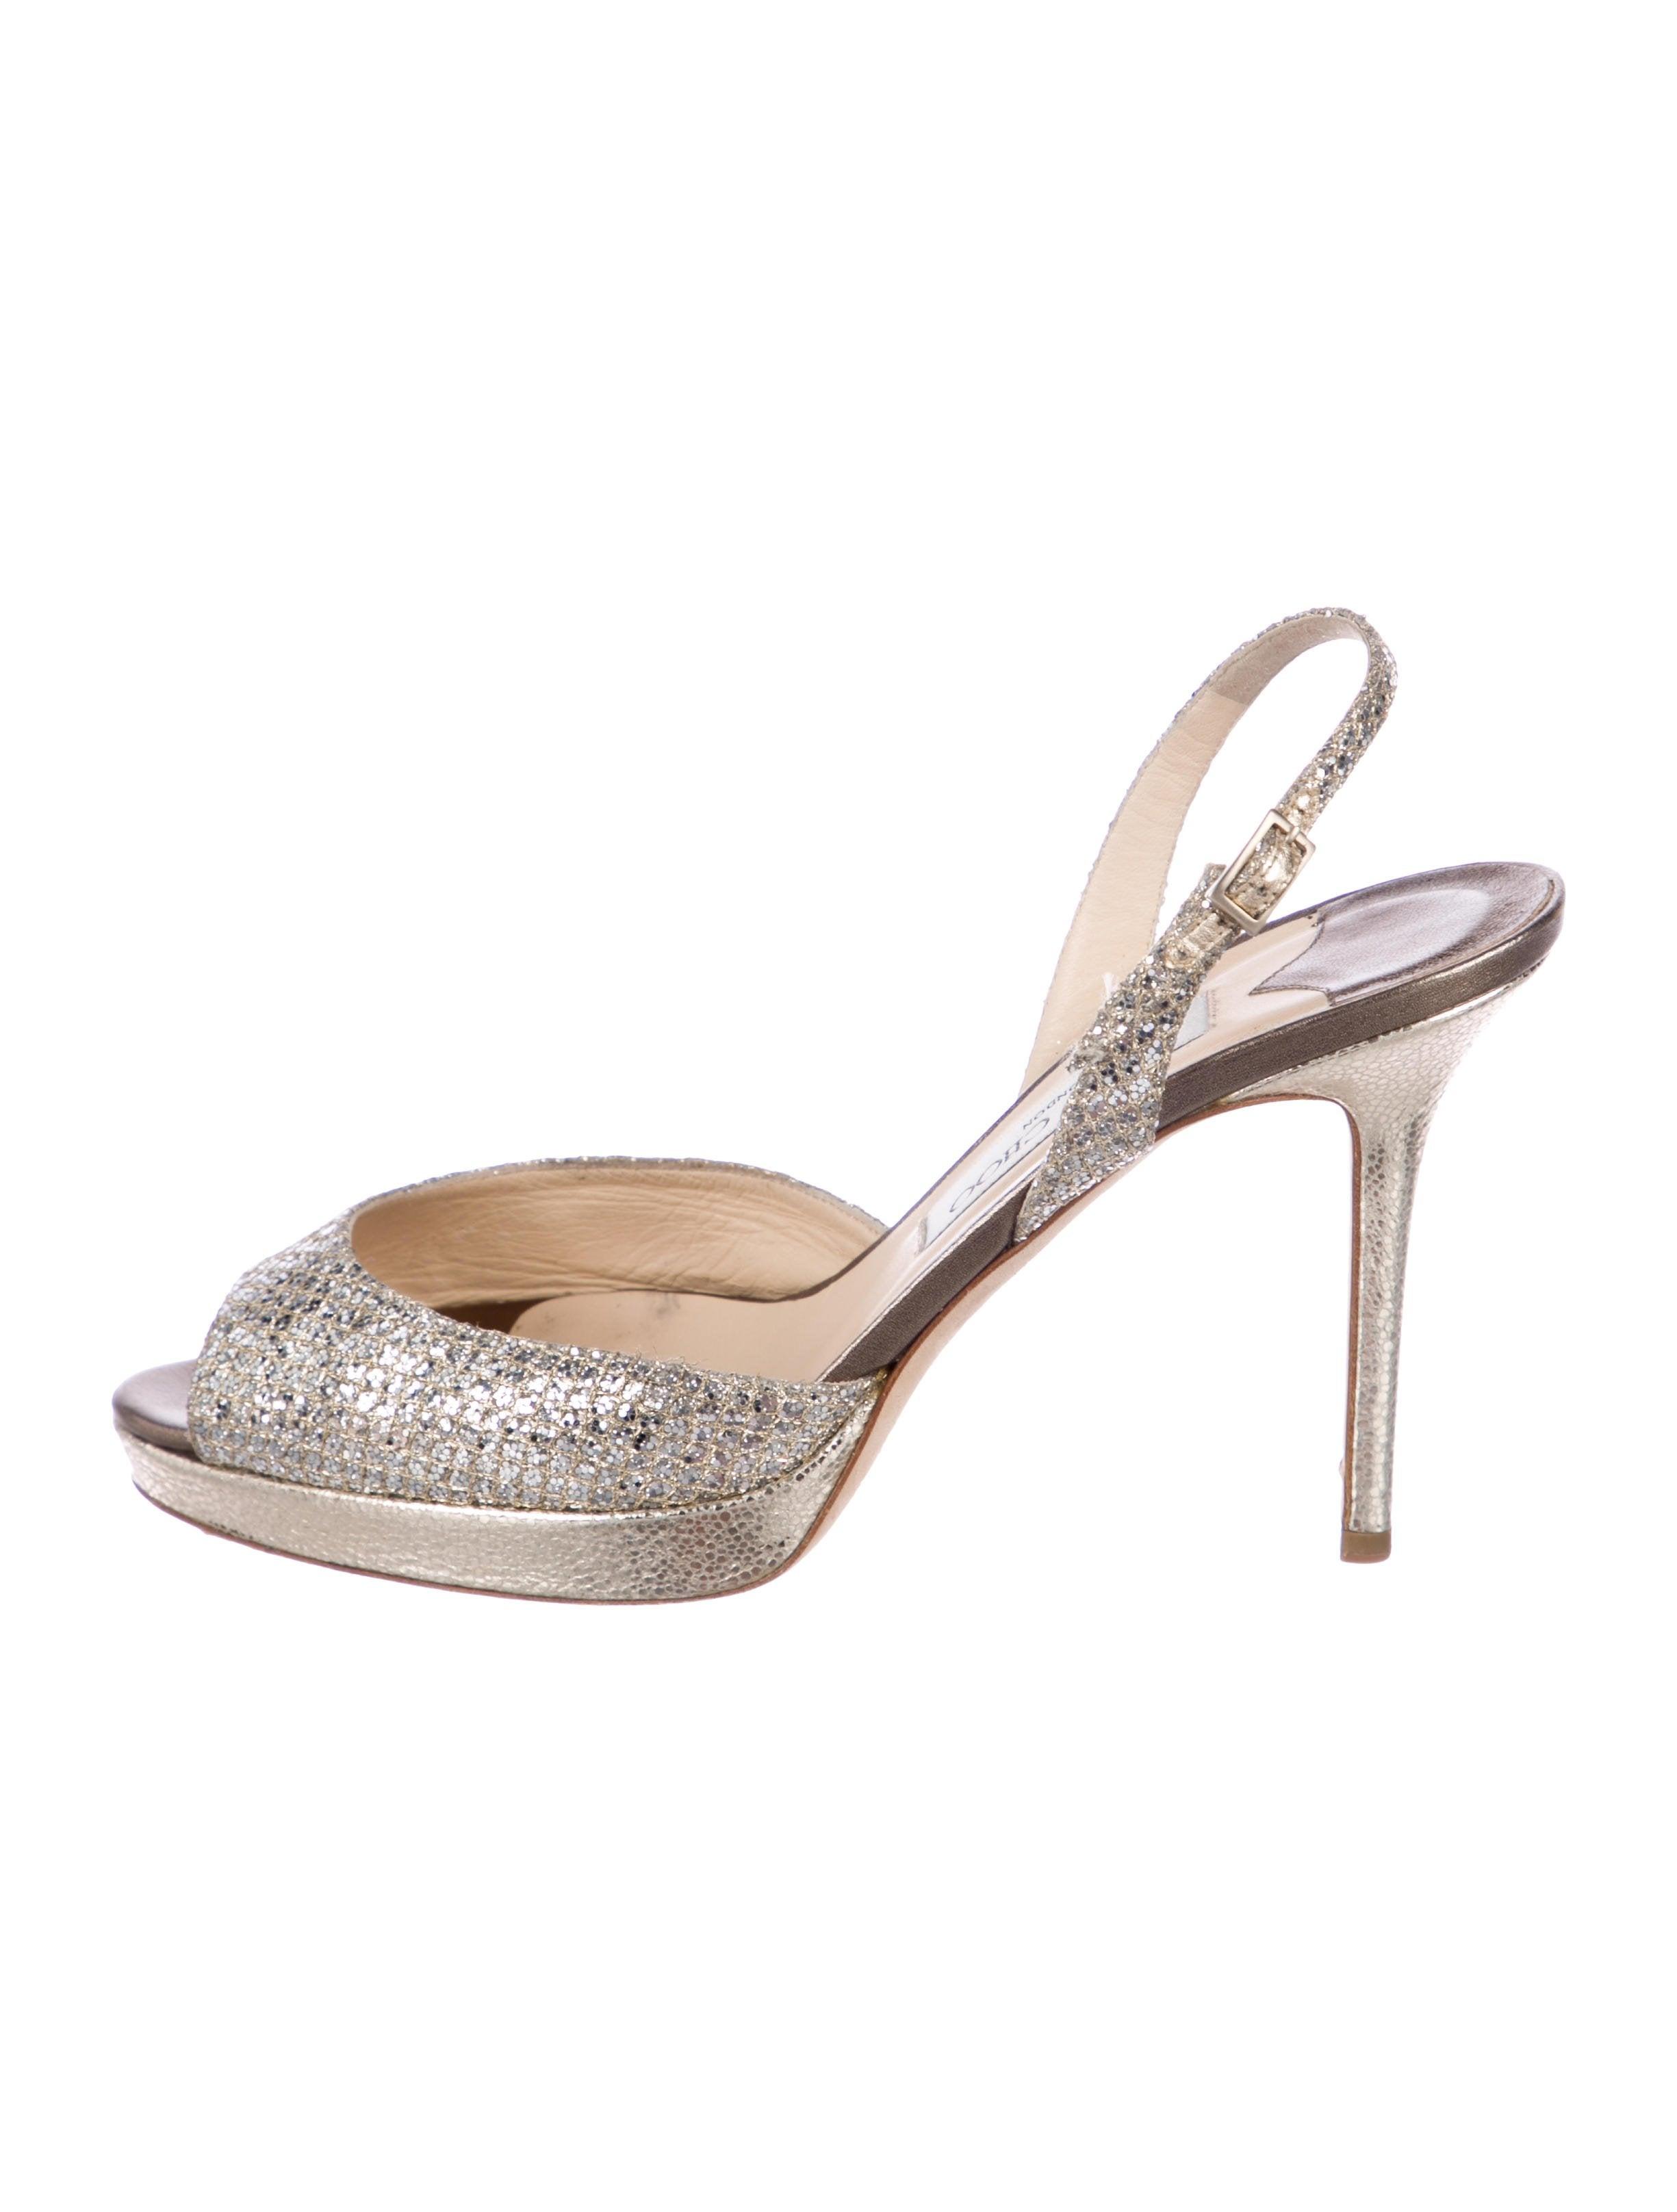 4a5afcd02a4a05 Jimmy Choo Brandy Glitter Sandals - Shoes - JIM110241